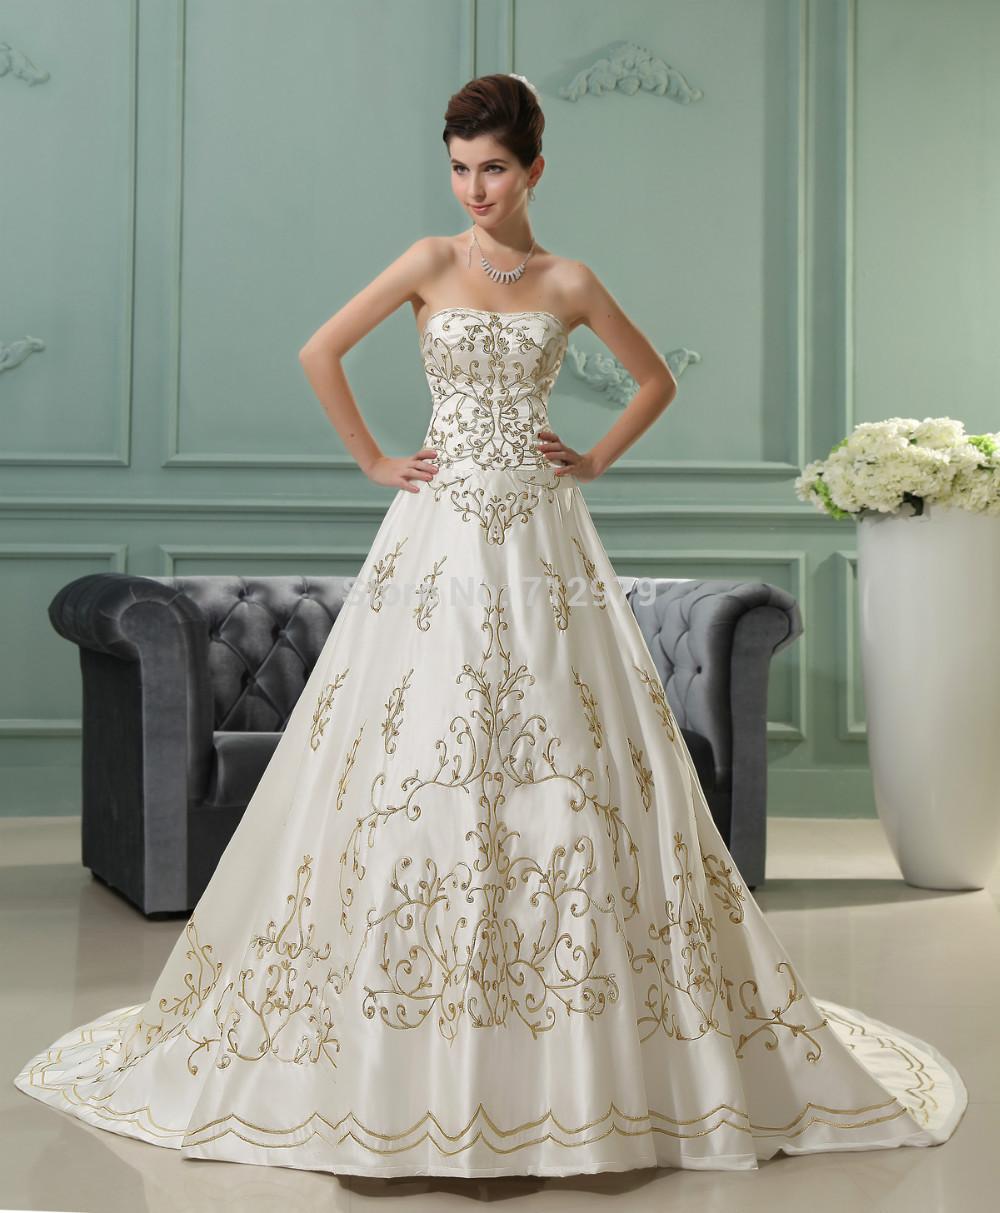 Robe de mariée prservation